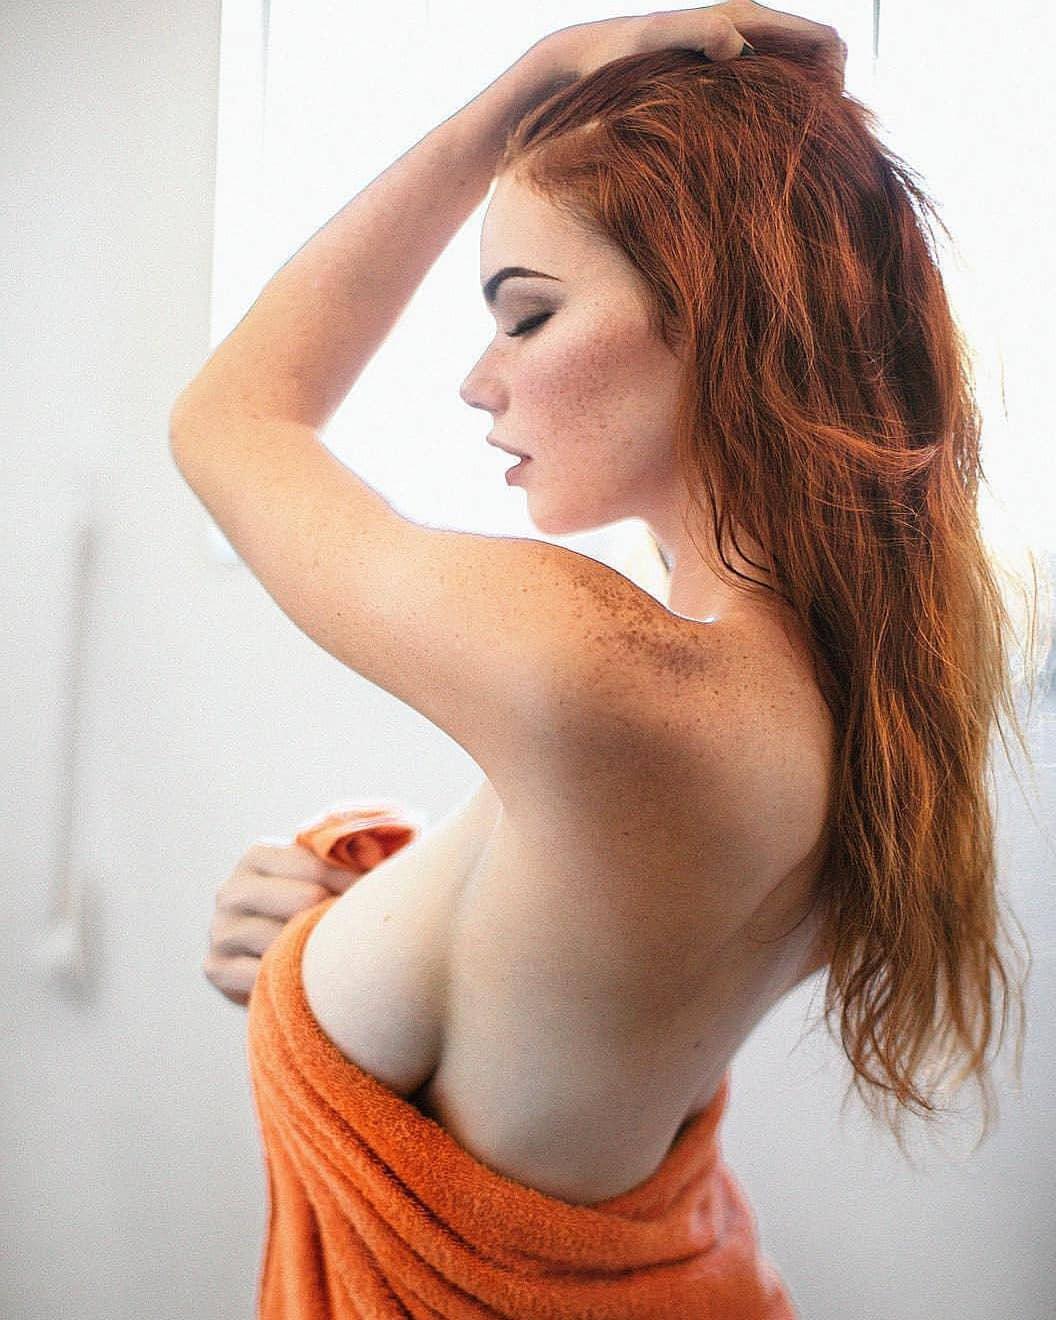 Tits Sabrina Lynn naked (72 foto and video), Sexy, Bikini, Boobs, underwear 2015